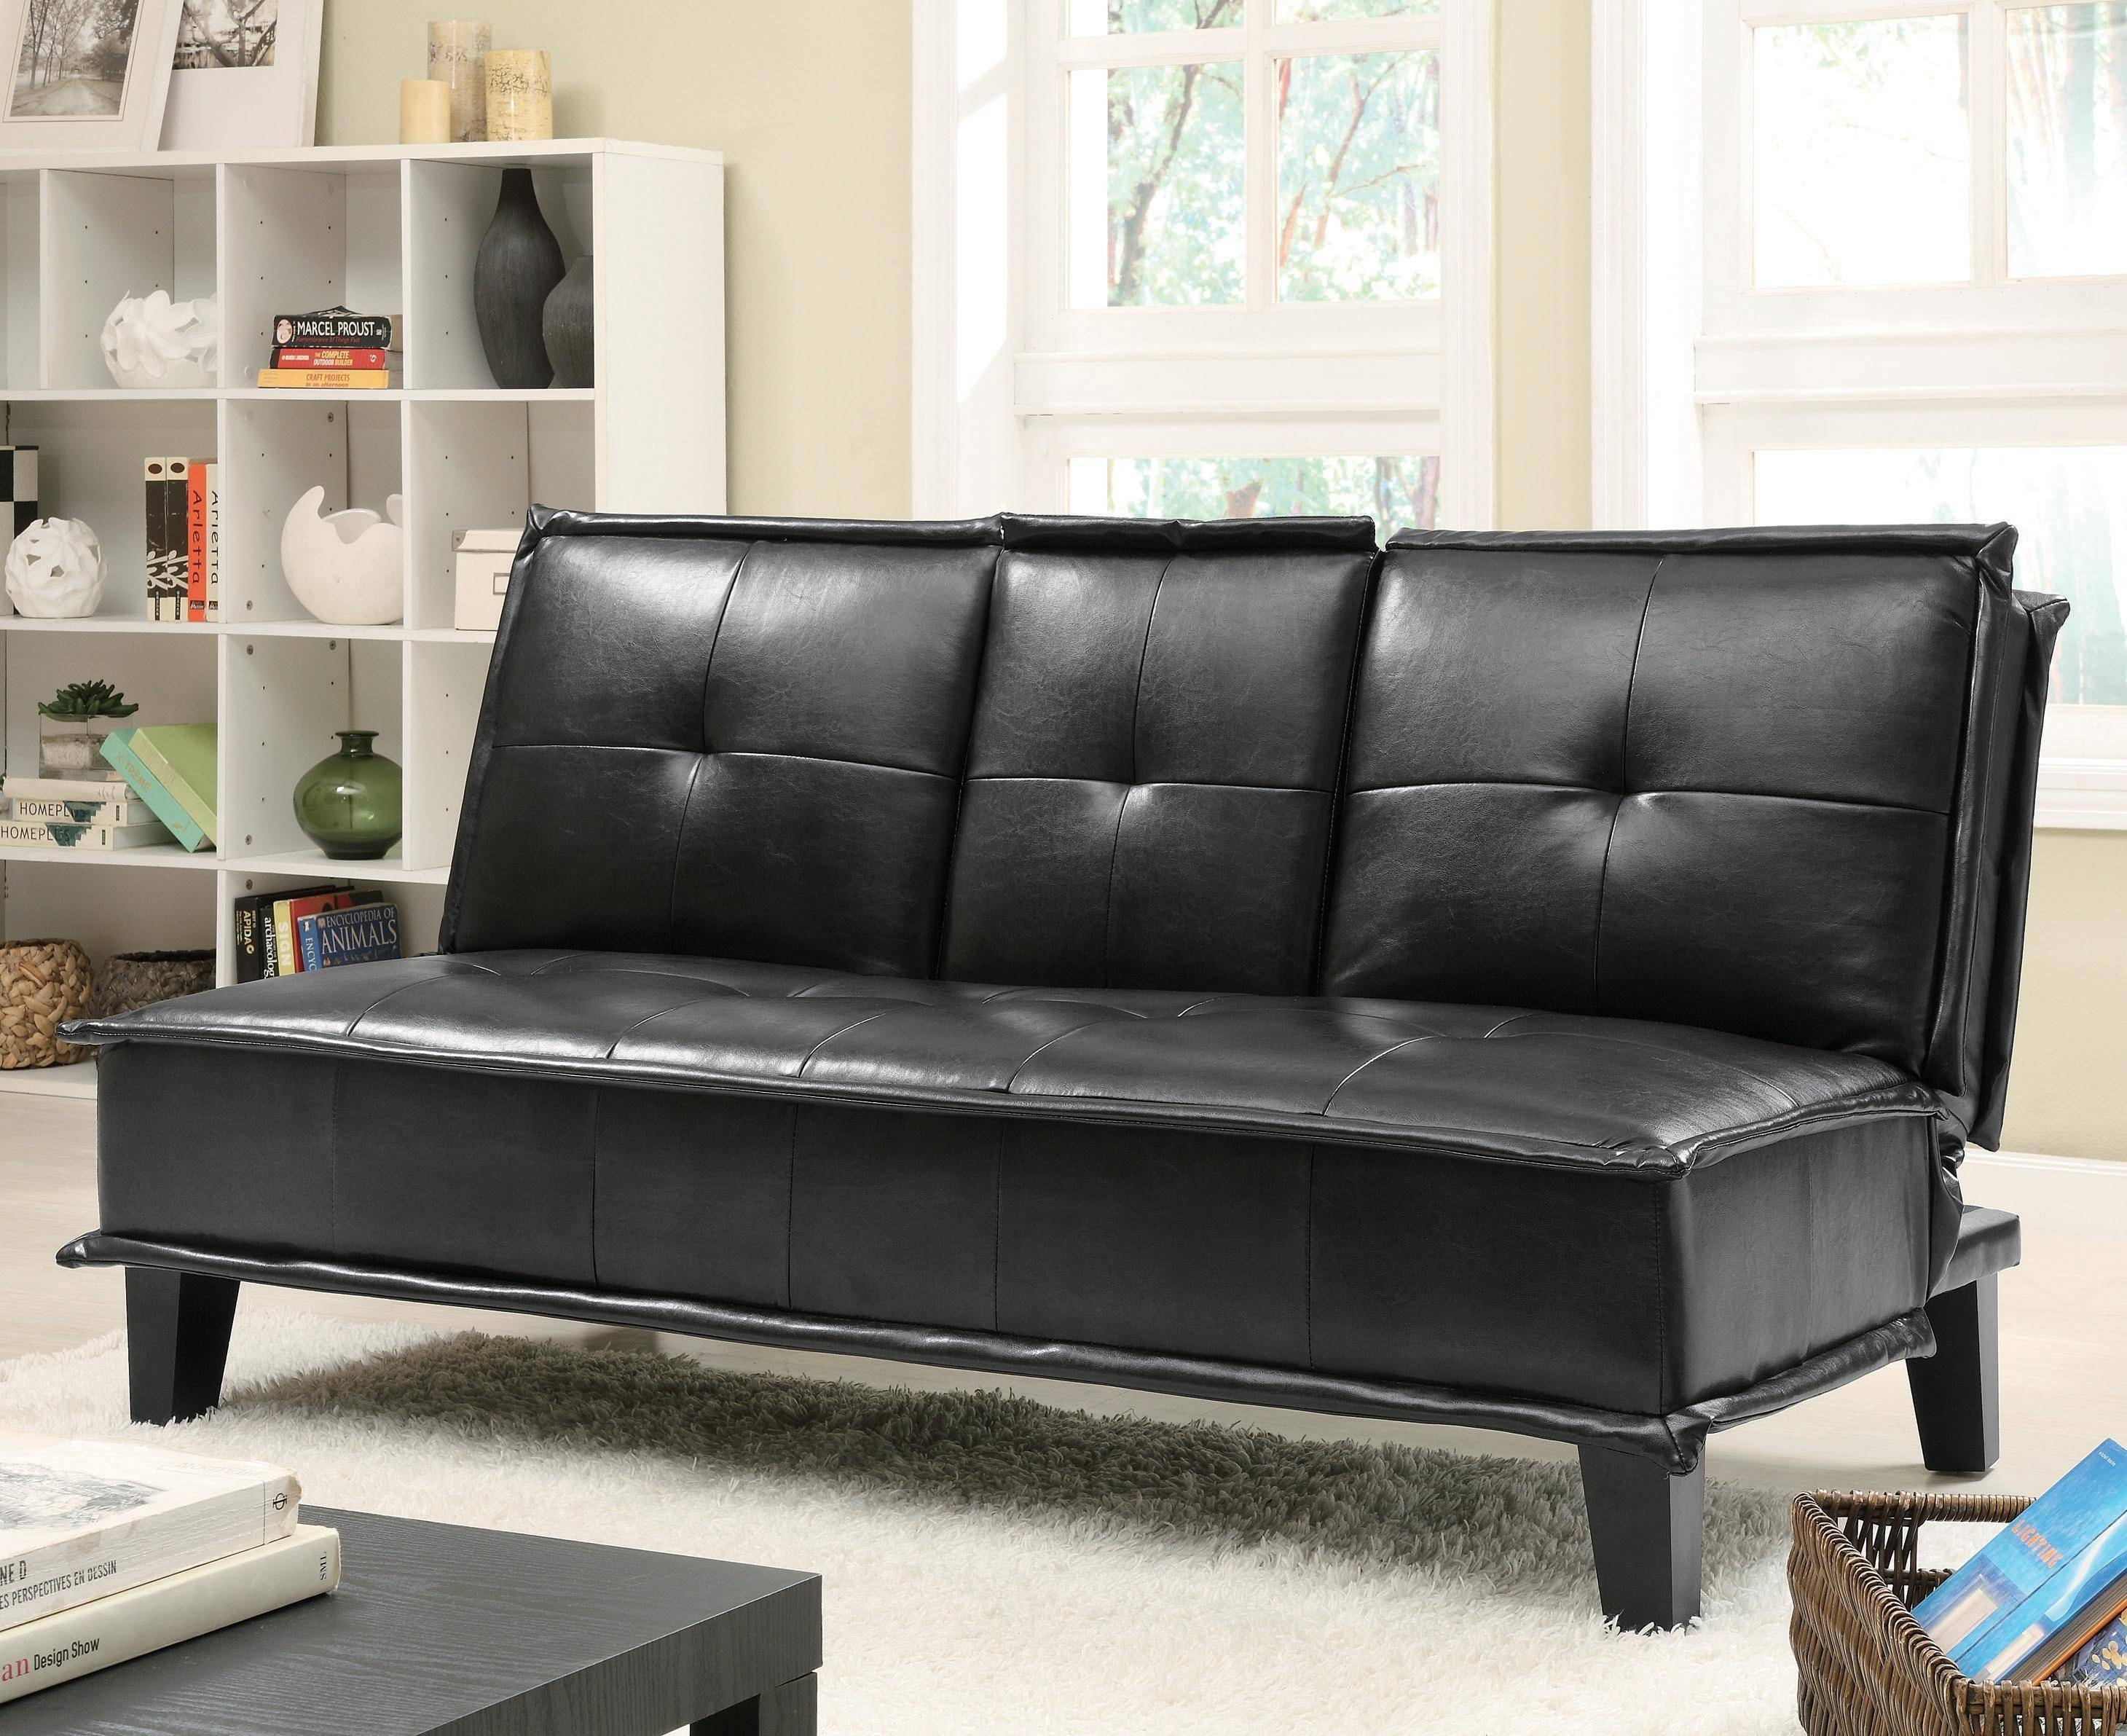 20 Ideas Of Black Vinyl Sofas | Sofa Ideas with Black Vinyl Sofas (Image 3 of 15)